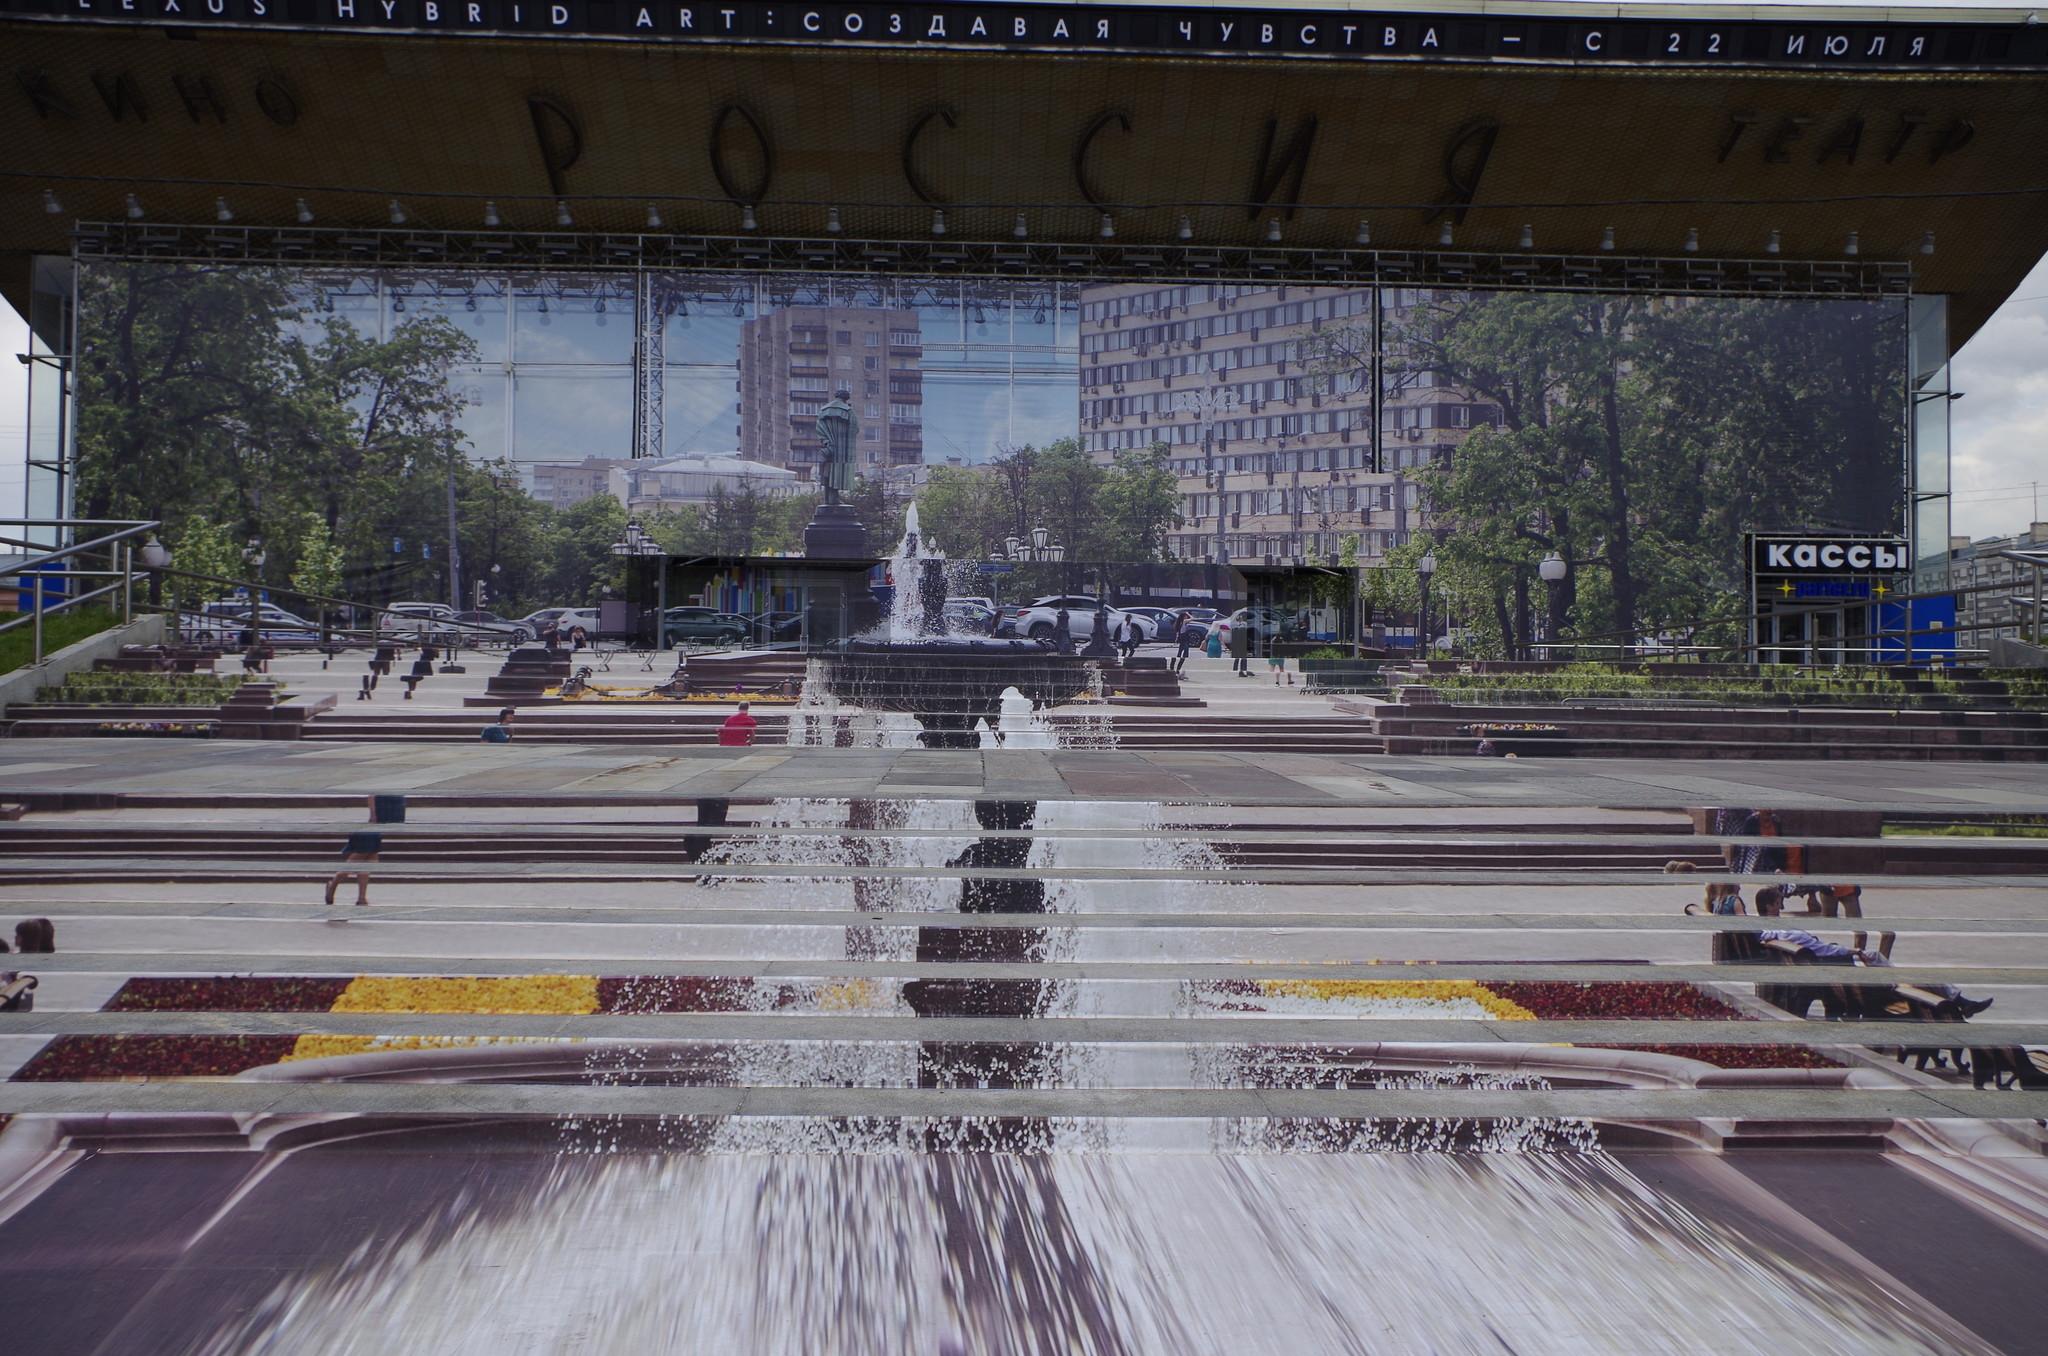 Инсталляция «Прямое зеркало» на Пушкинской площади